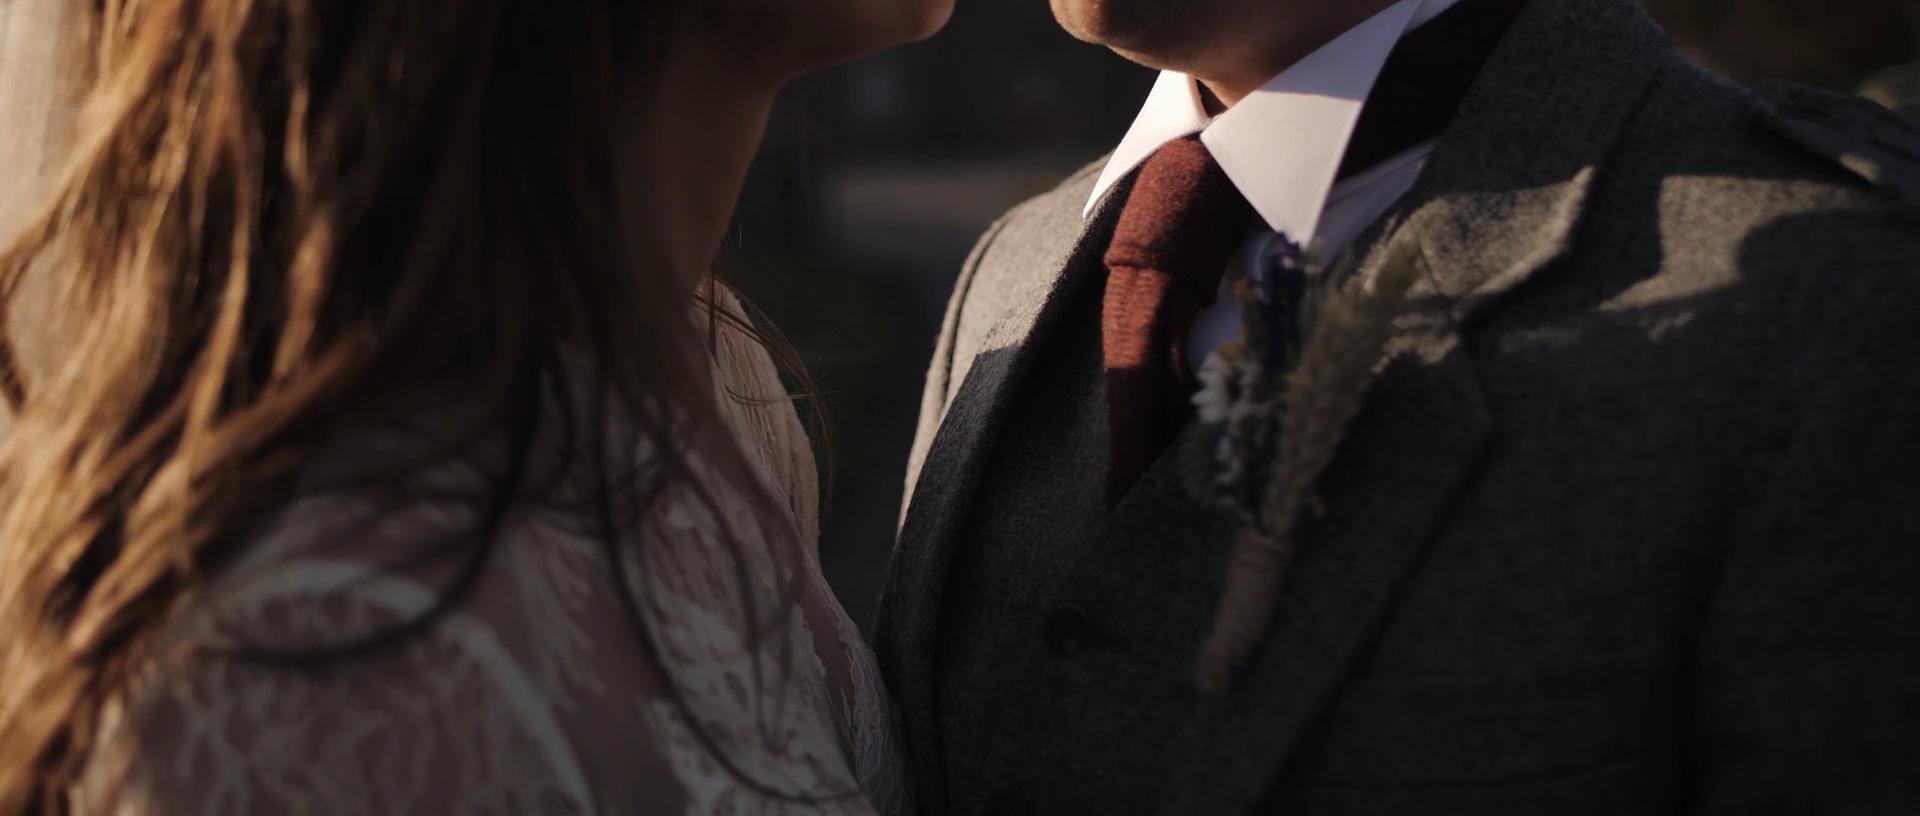 forgans-wedding-videographer_LL_04.jpg